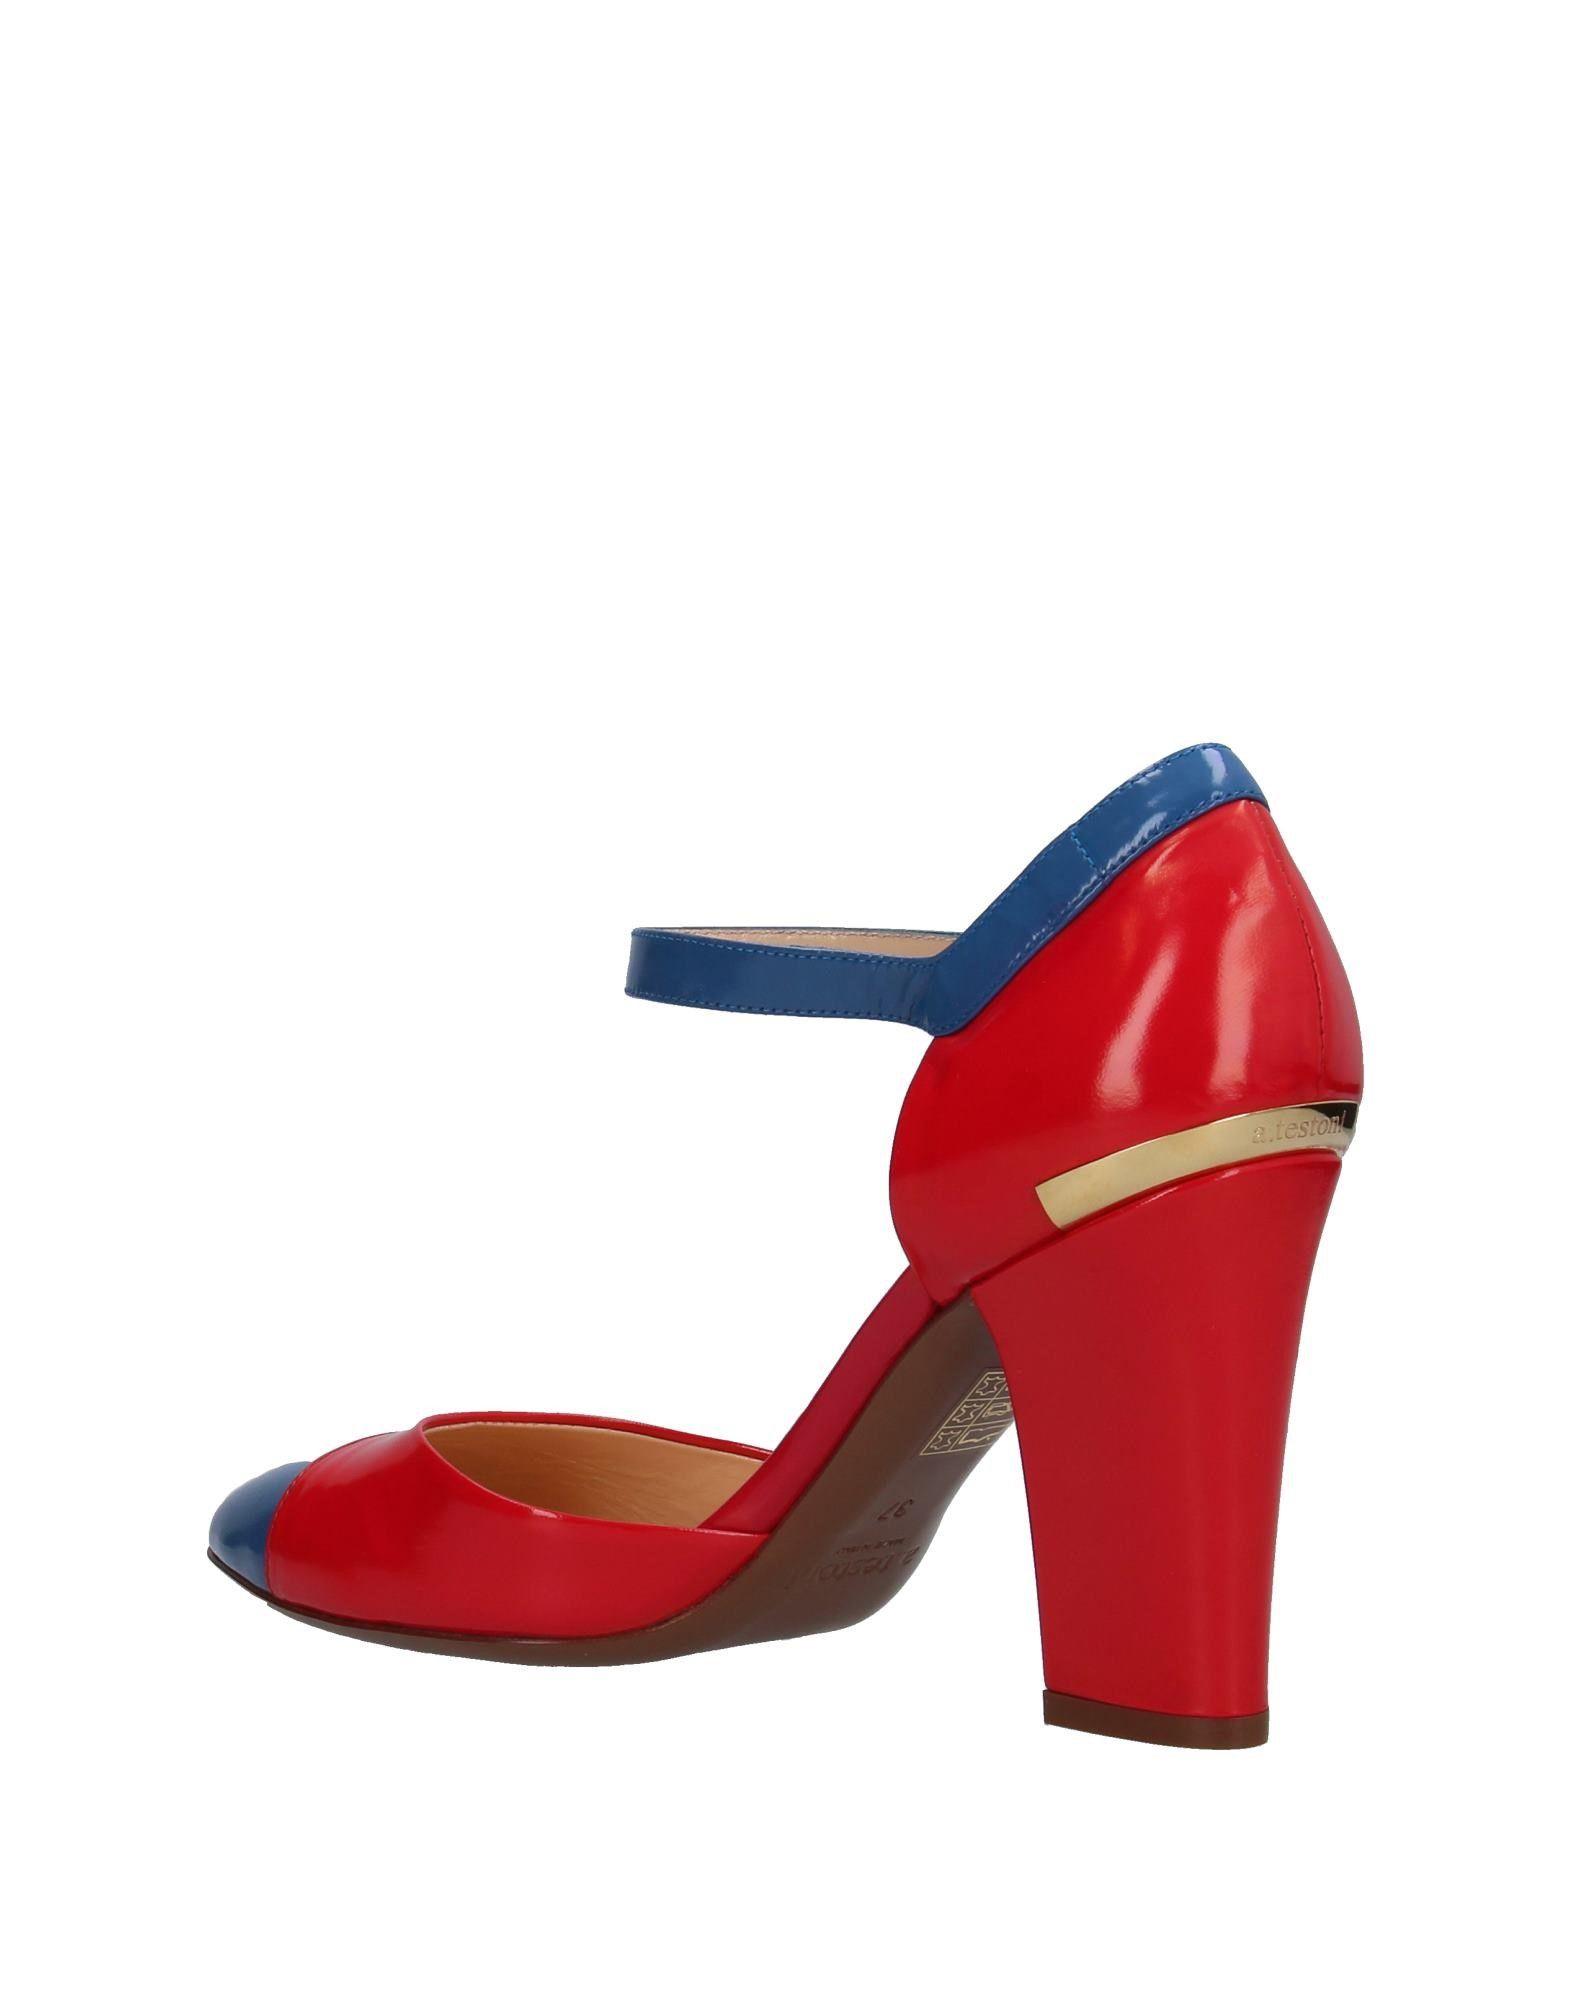 Stilvolle Stilvolle Stilvolle billige Schuhe A.Testoni Pumps Damen  11408452IJ 18fcbe